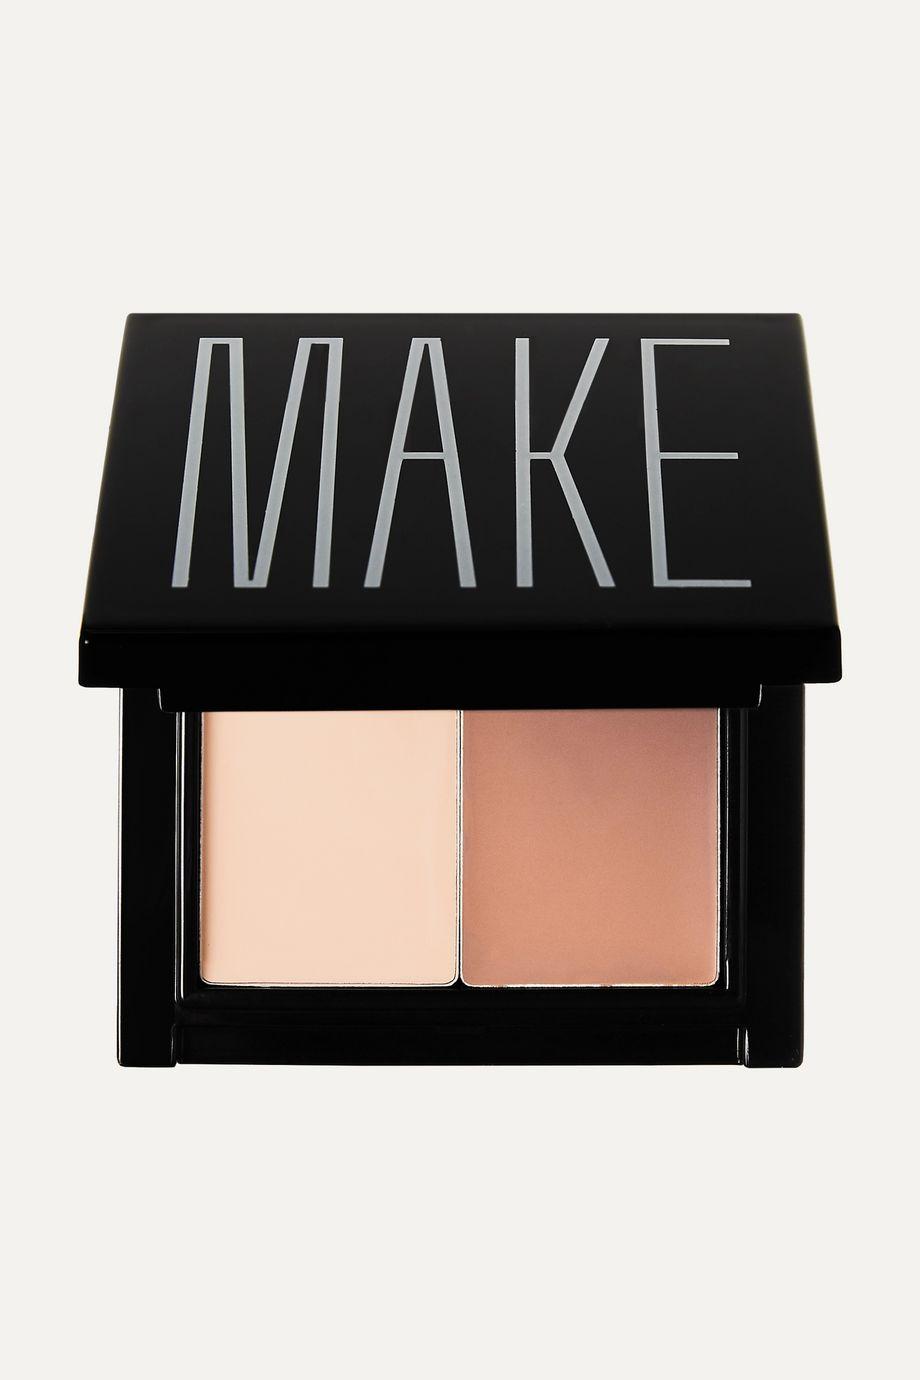 MAKE Beauty Contour Highlight - Warm 1